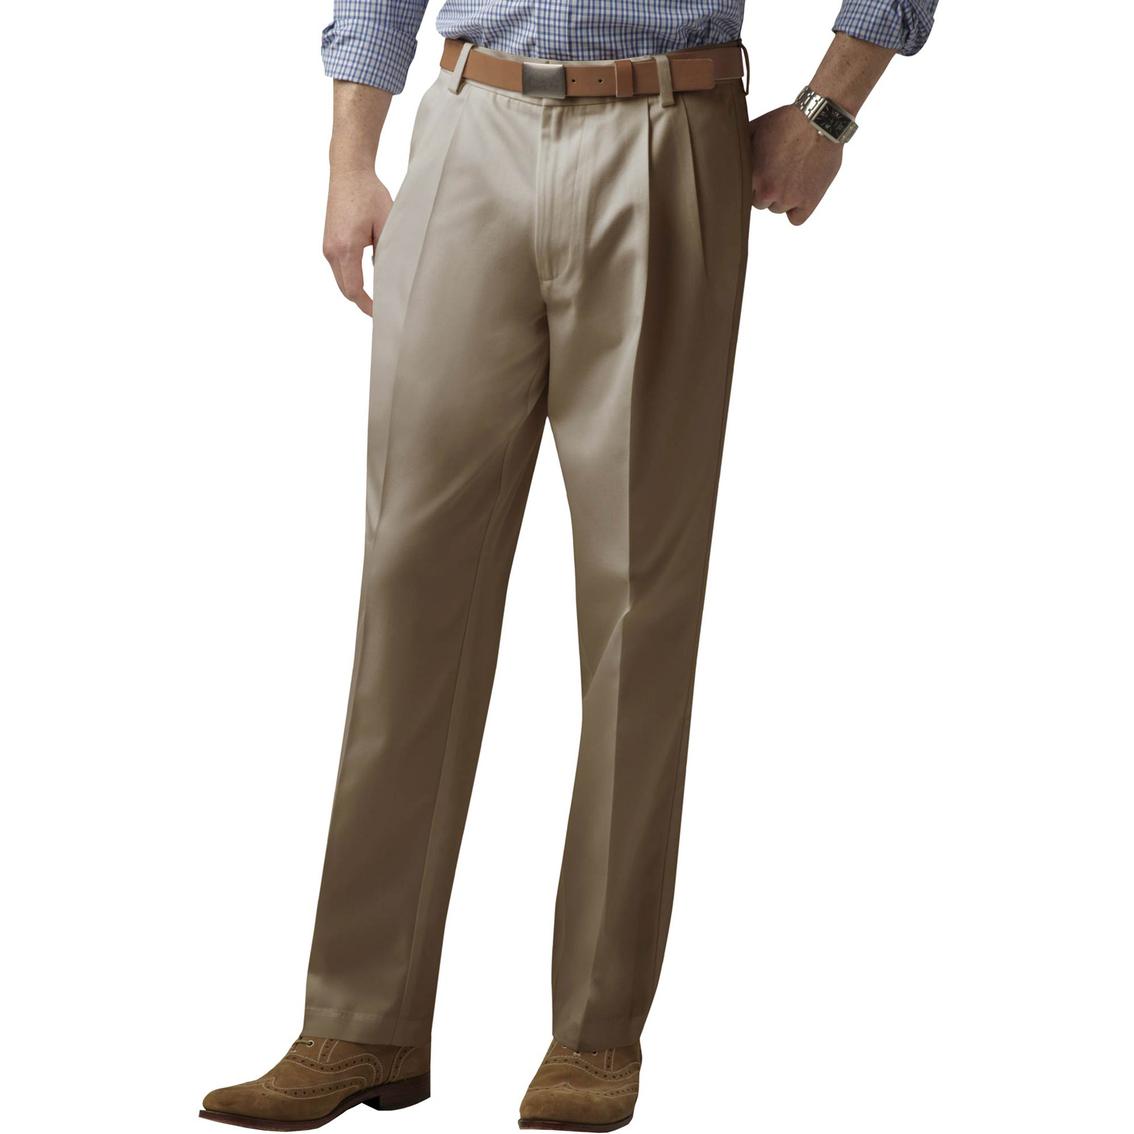 Dockers Men/'s Pants Big /& Tall Pleated Signature Khaki Casual Dress Pant NEW All